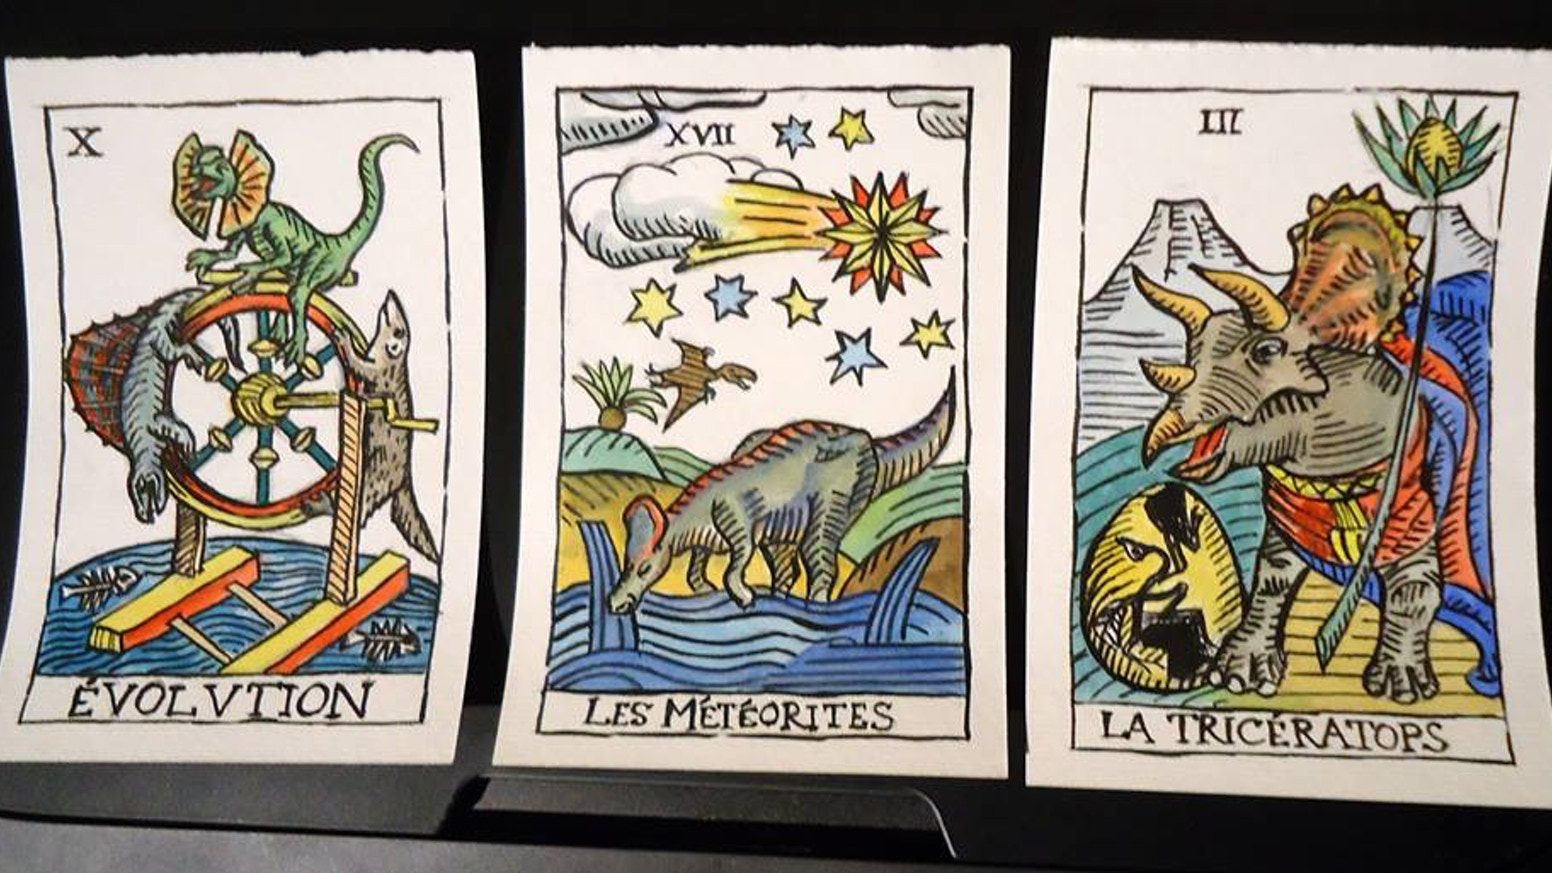 Dinosaur themed tarot deck in a classic Marseille style.